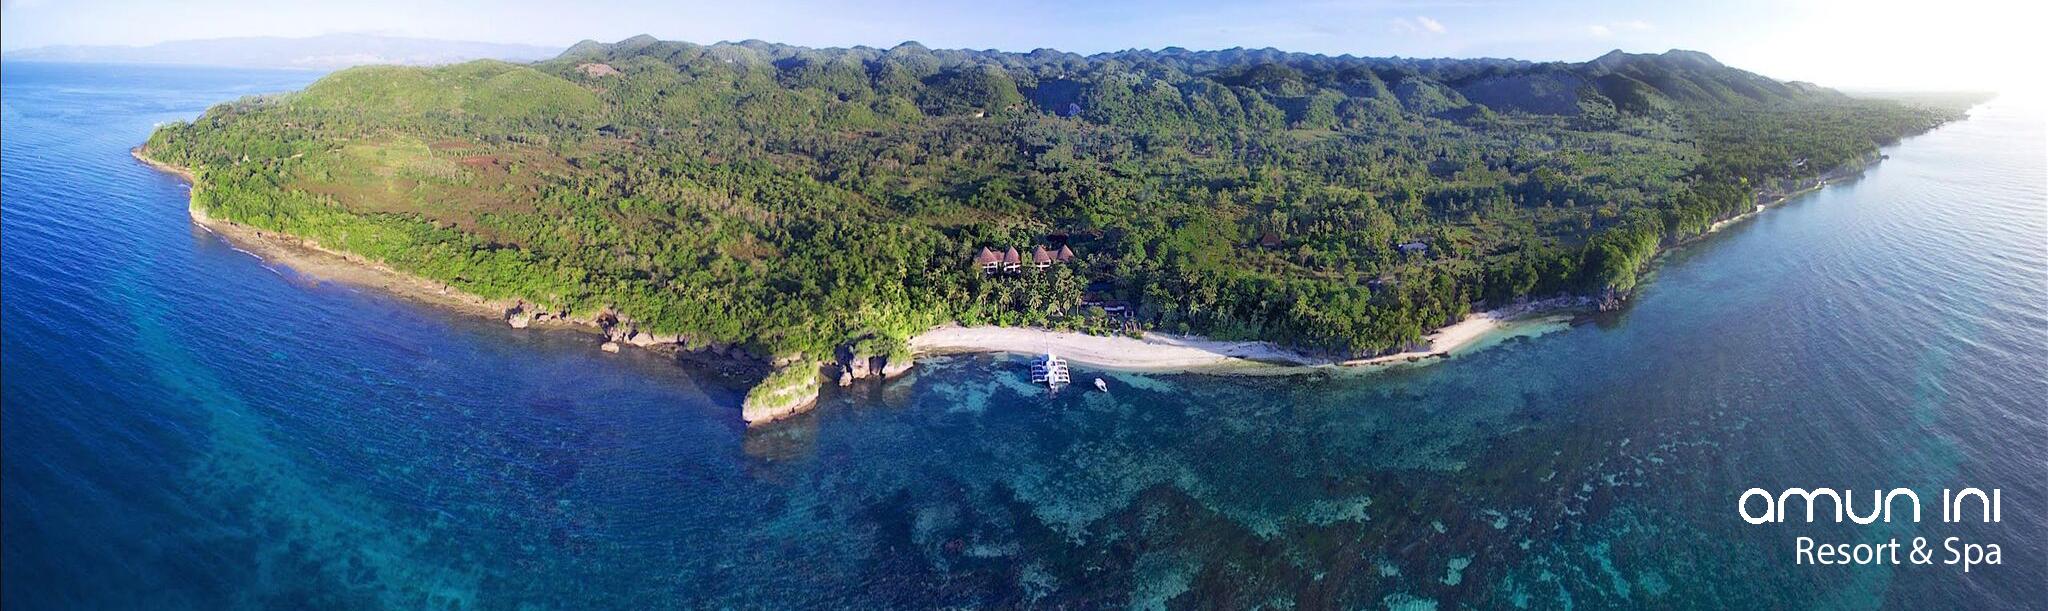 Amun Ini Beach Resort & Spa - Luftaufnahme 1